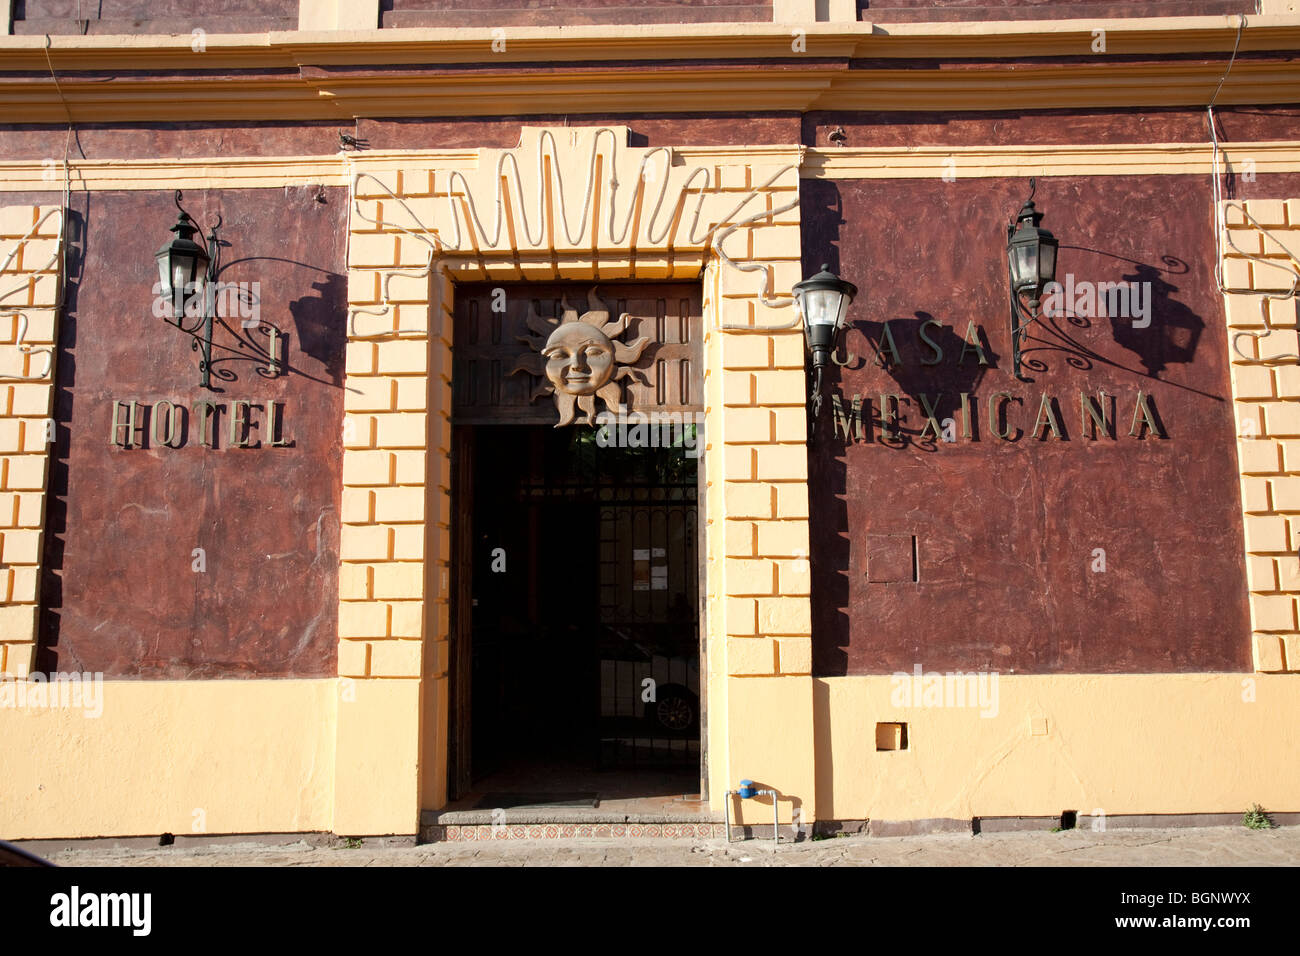 Hotel casa mexicana san crist bal de las casas chiapas for Hotel azulejos san cristobal delas casas chiapas